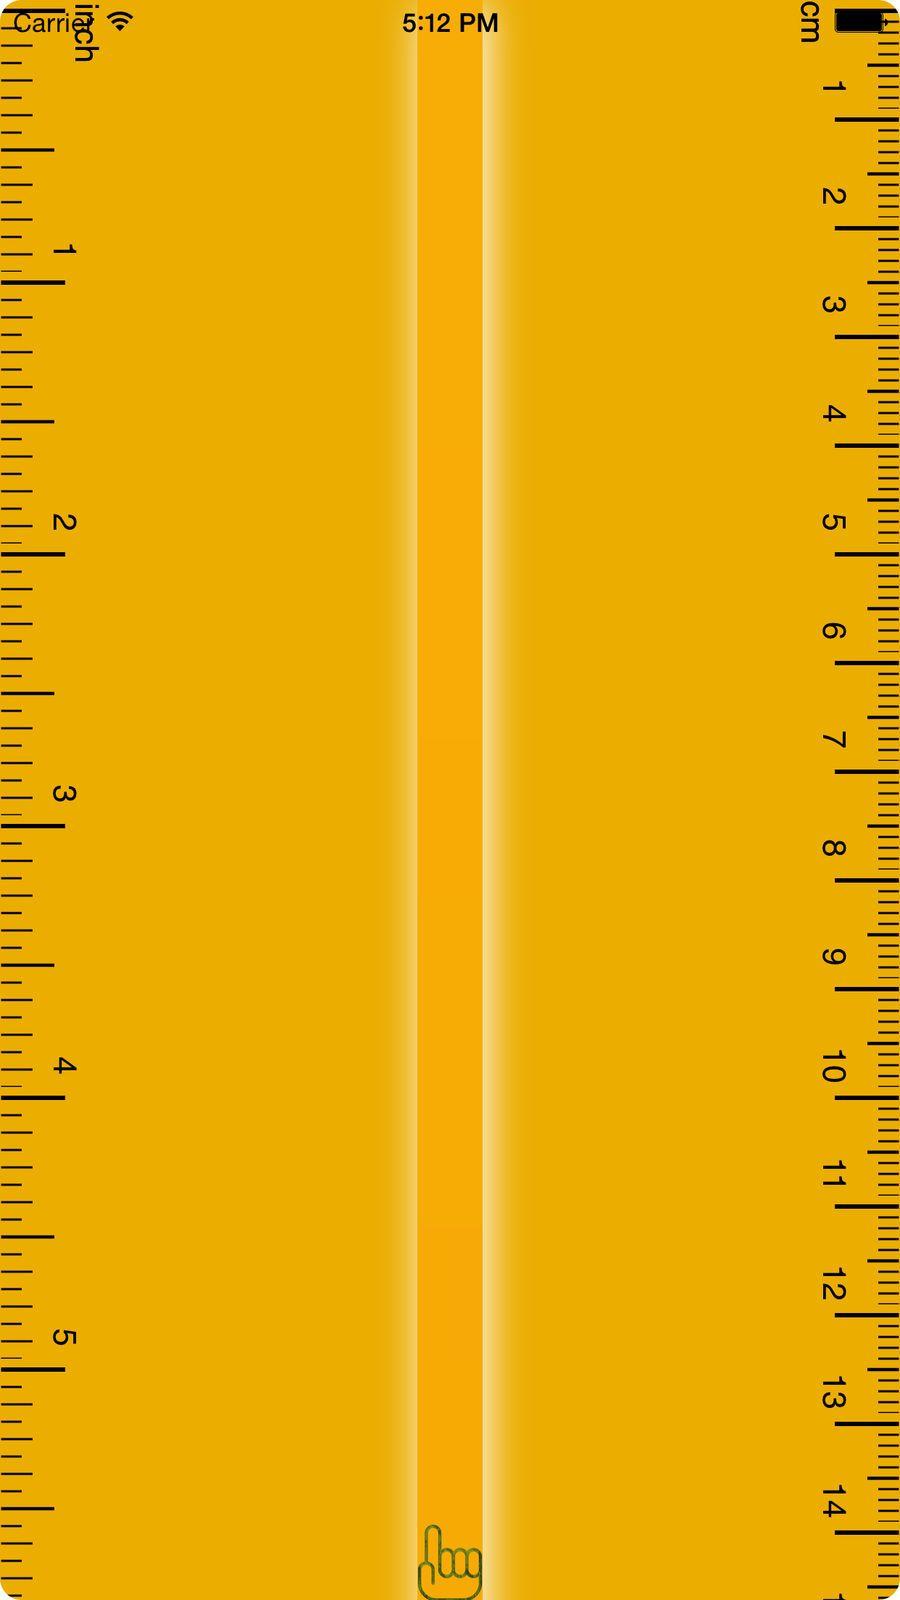 Digital Ruler , Pocket Measure ProductivityGiangPhoto